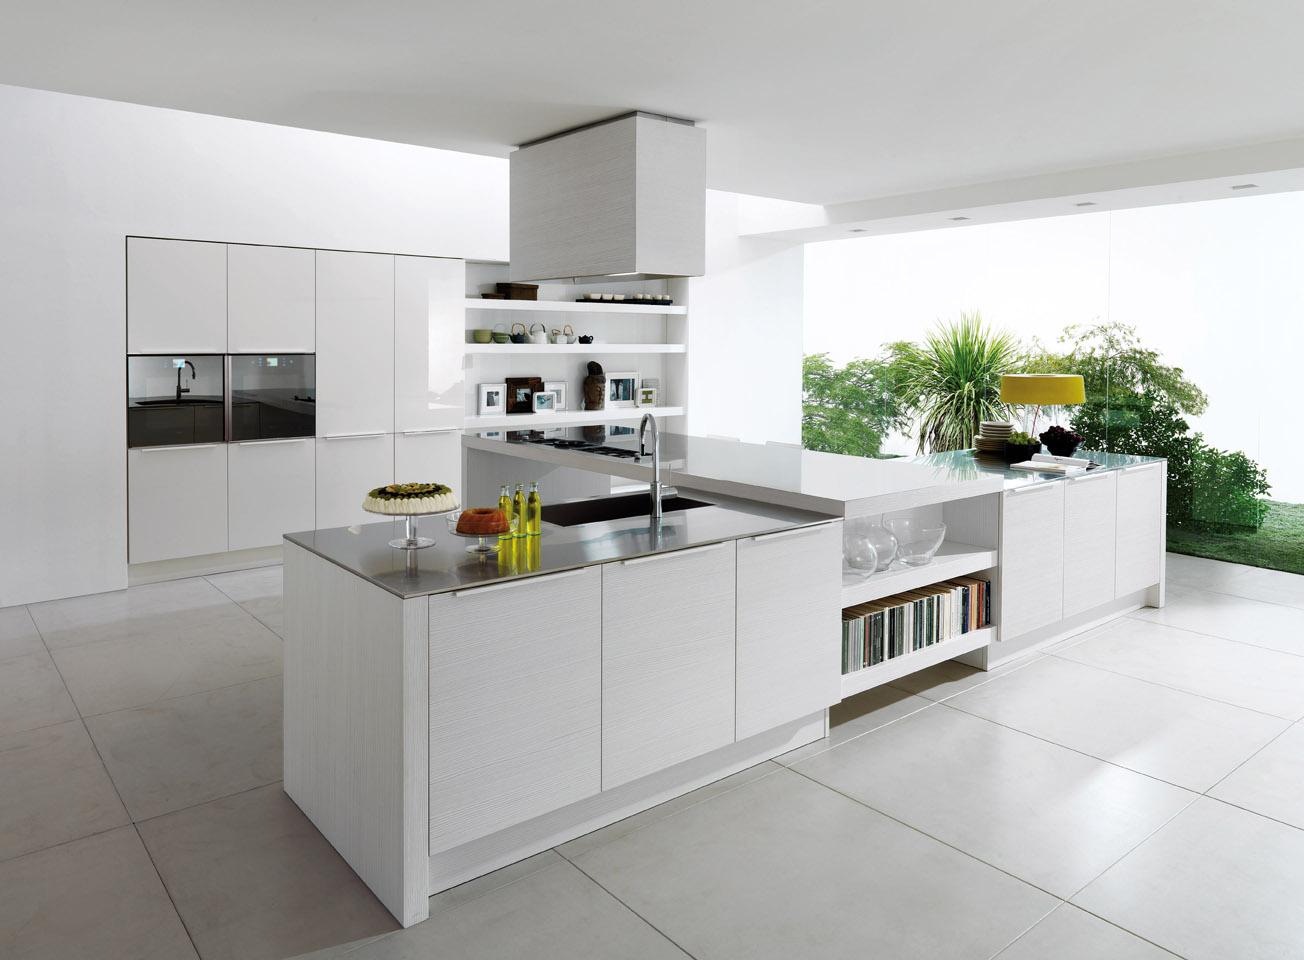 Blue and white kitchen curtains | Kitchen ideas